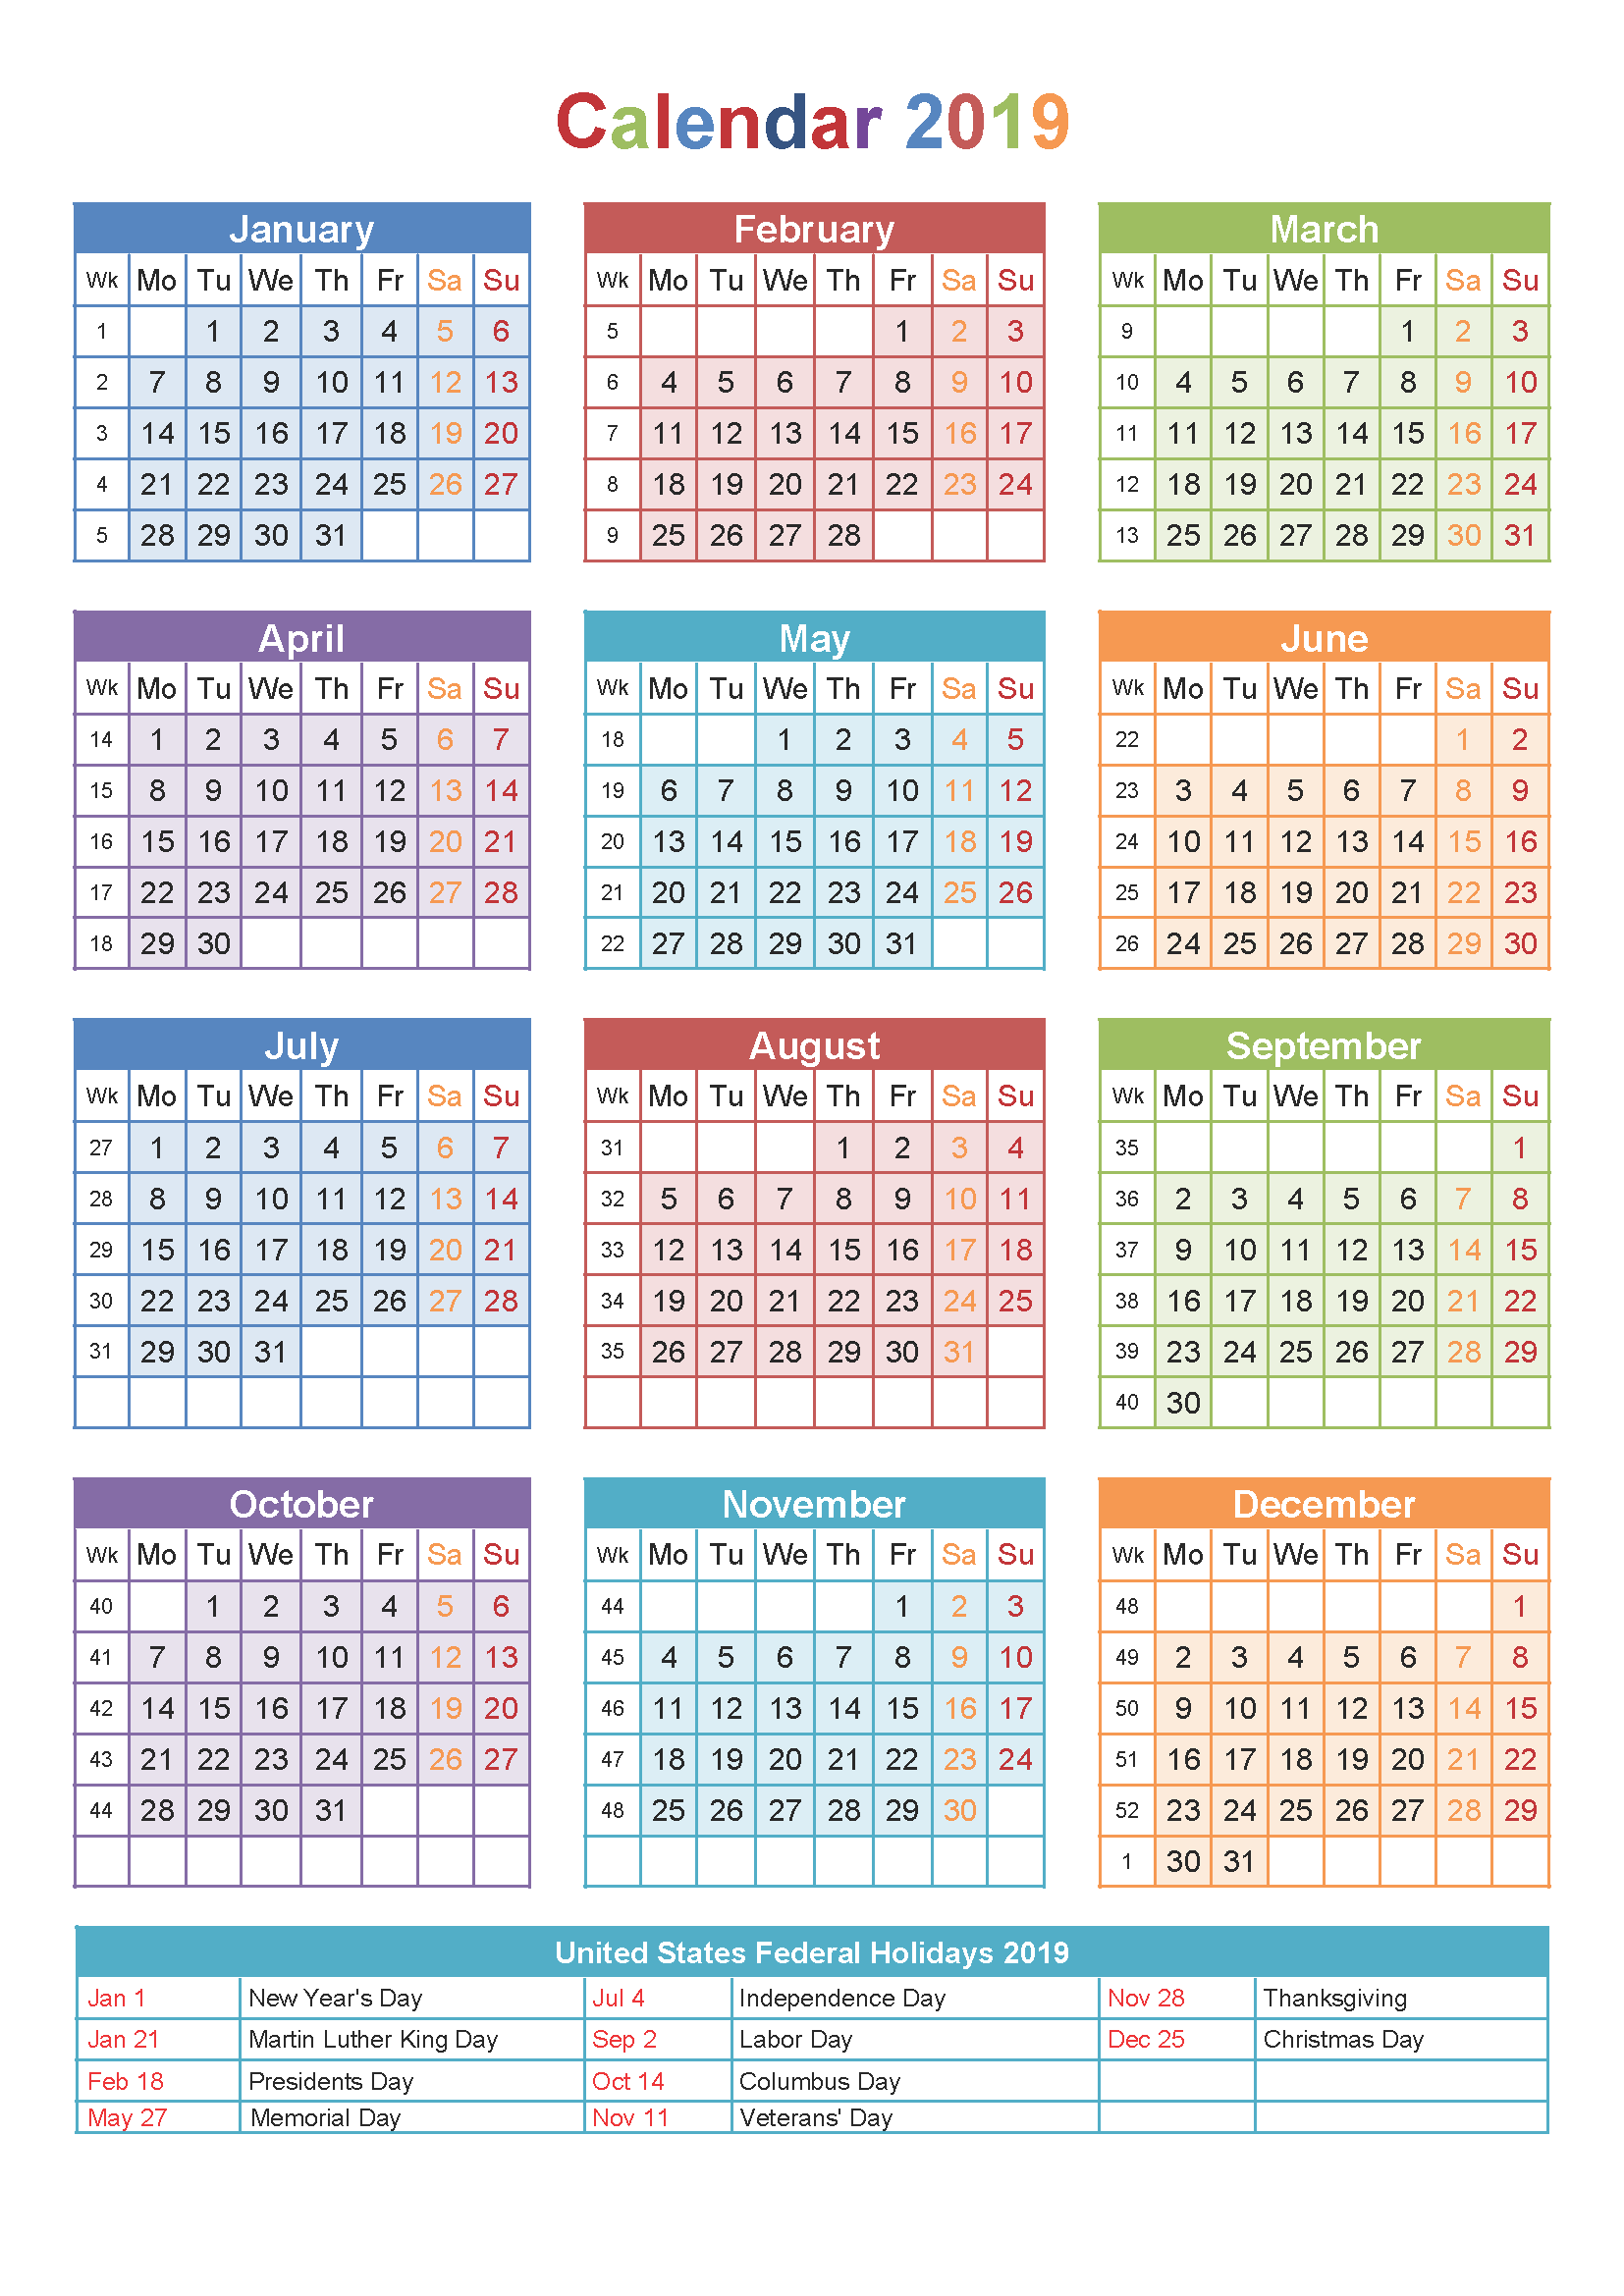 Get Free Printable Calendar 2019 Templates | Printable ...